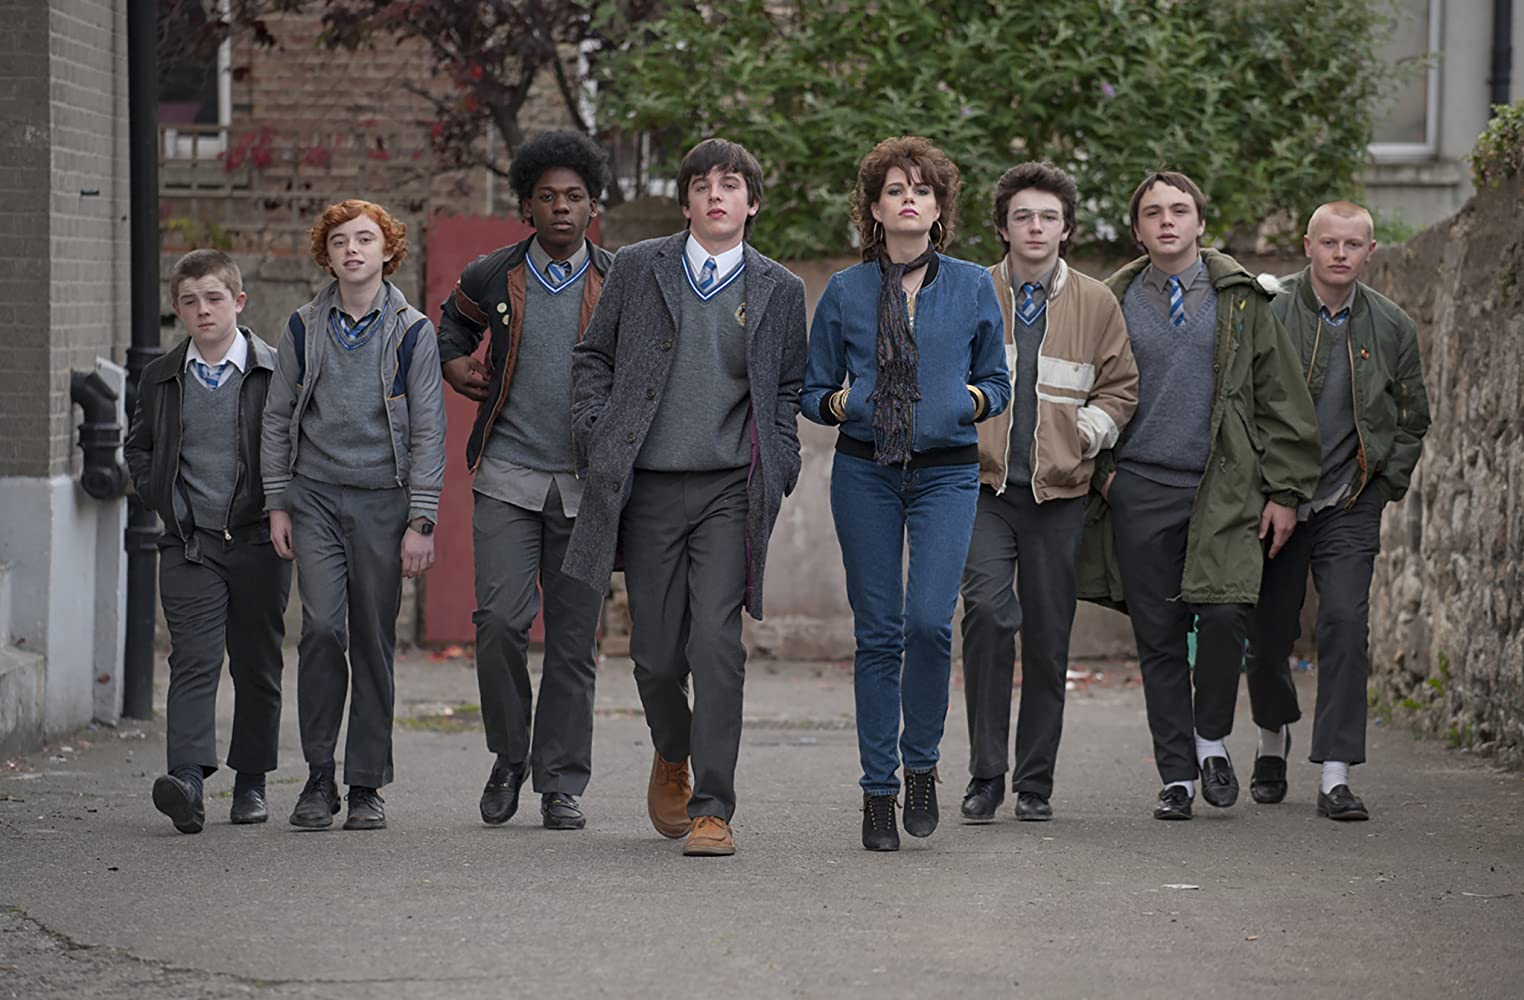 Lucy Boynton, Ian Kenny, Ferdia Walsh-Peelo, Mark McKenna, Ben Carolan, and Percy Chamburuka in Sing Street (2016)